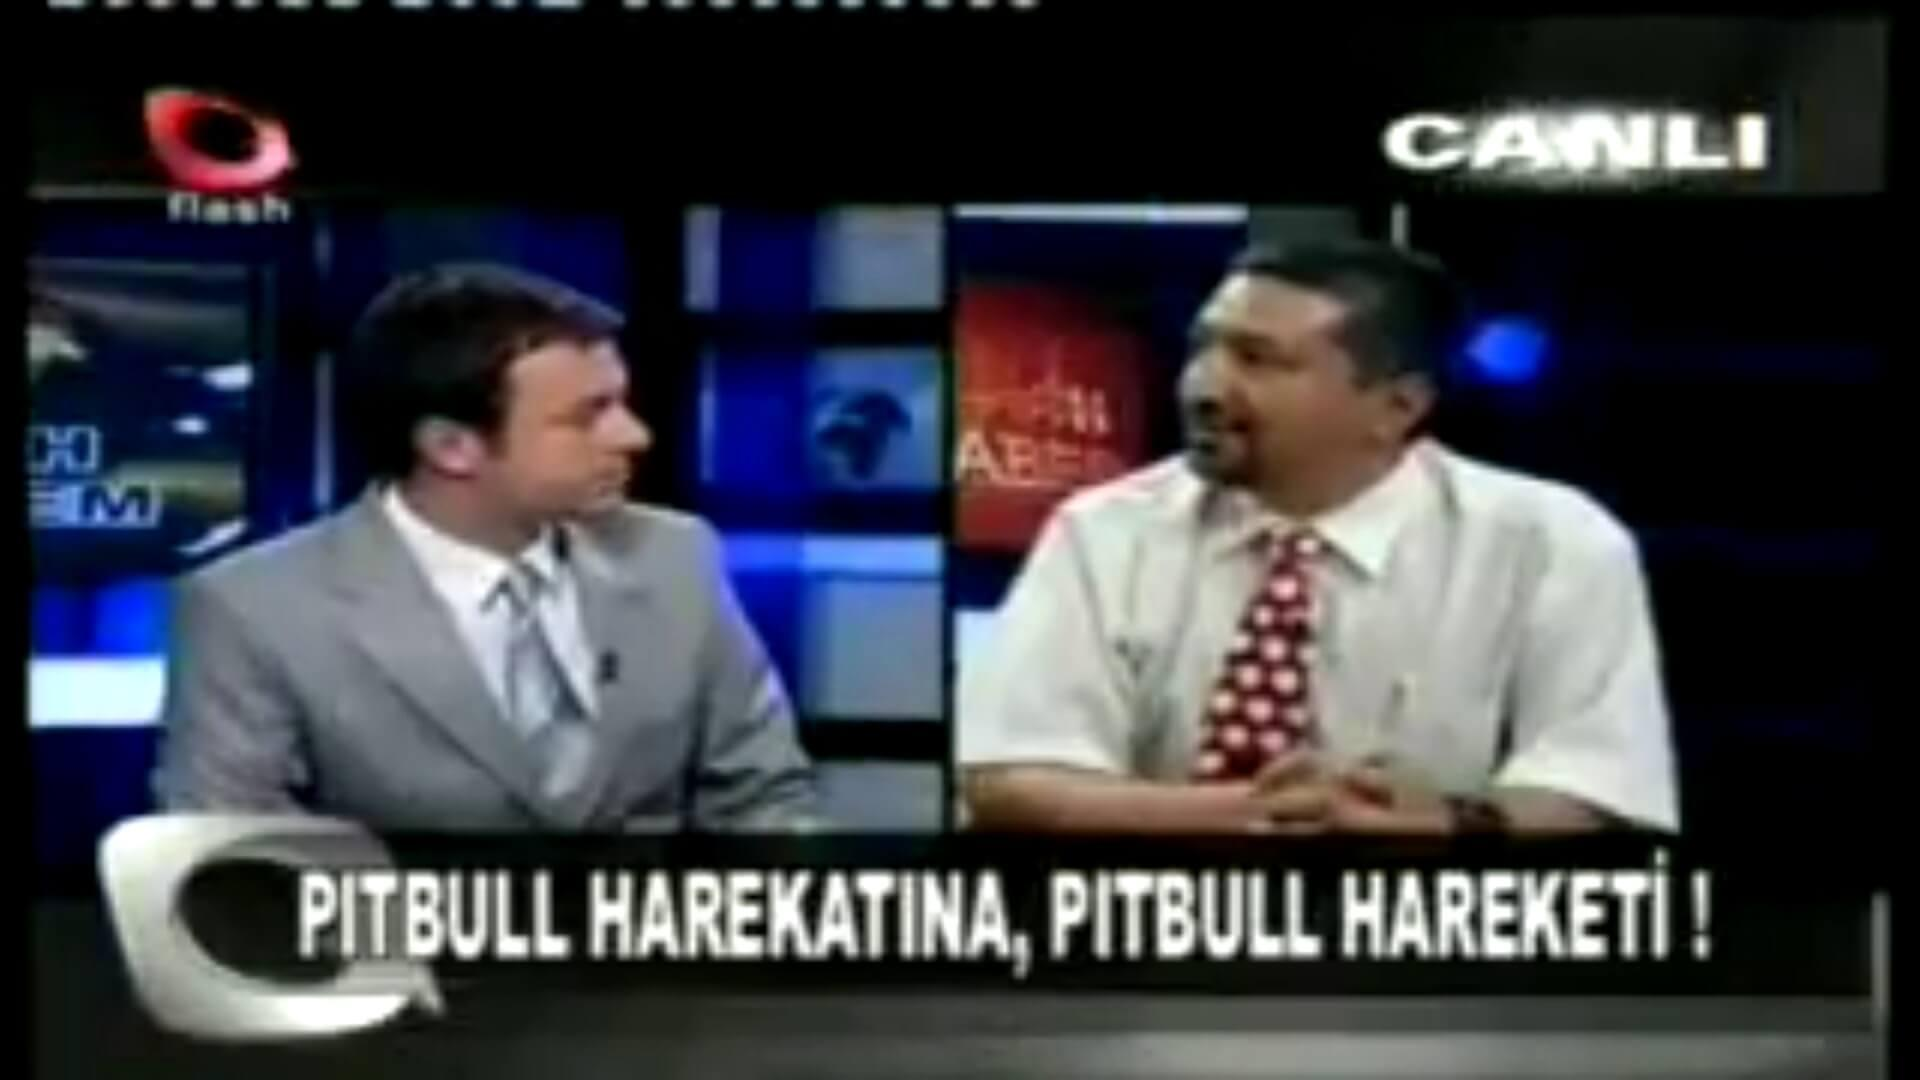 Pitbullar Saldırırsa ? – Tv Yayını